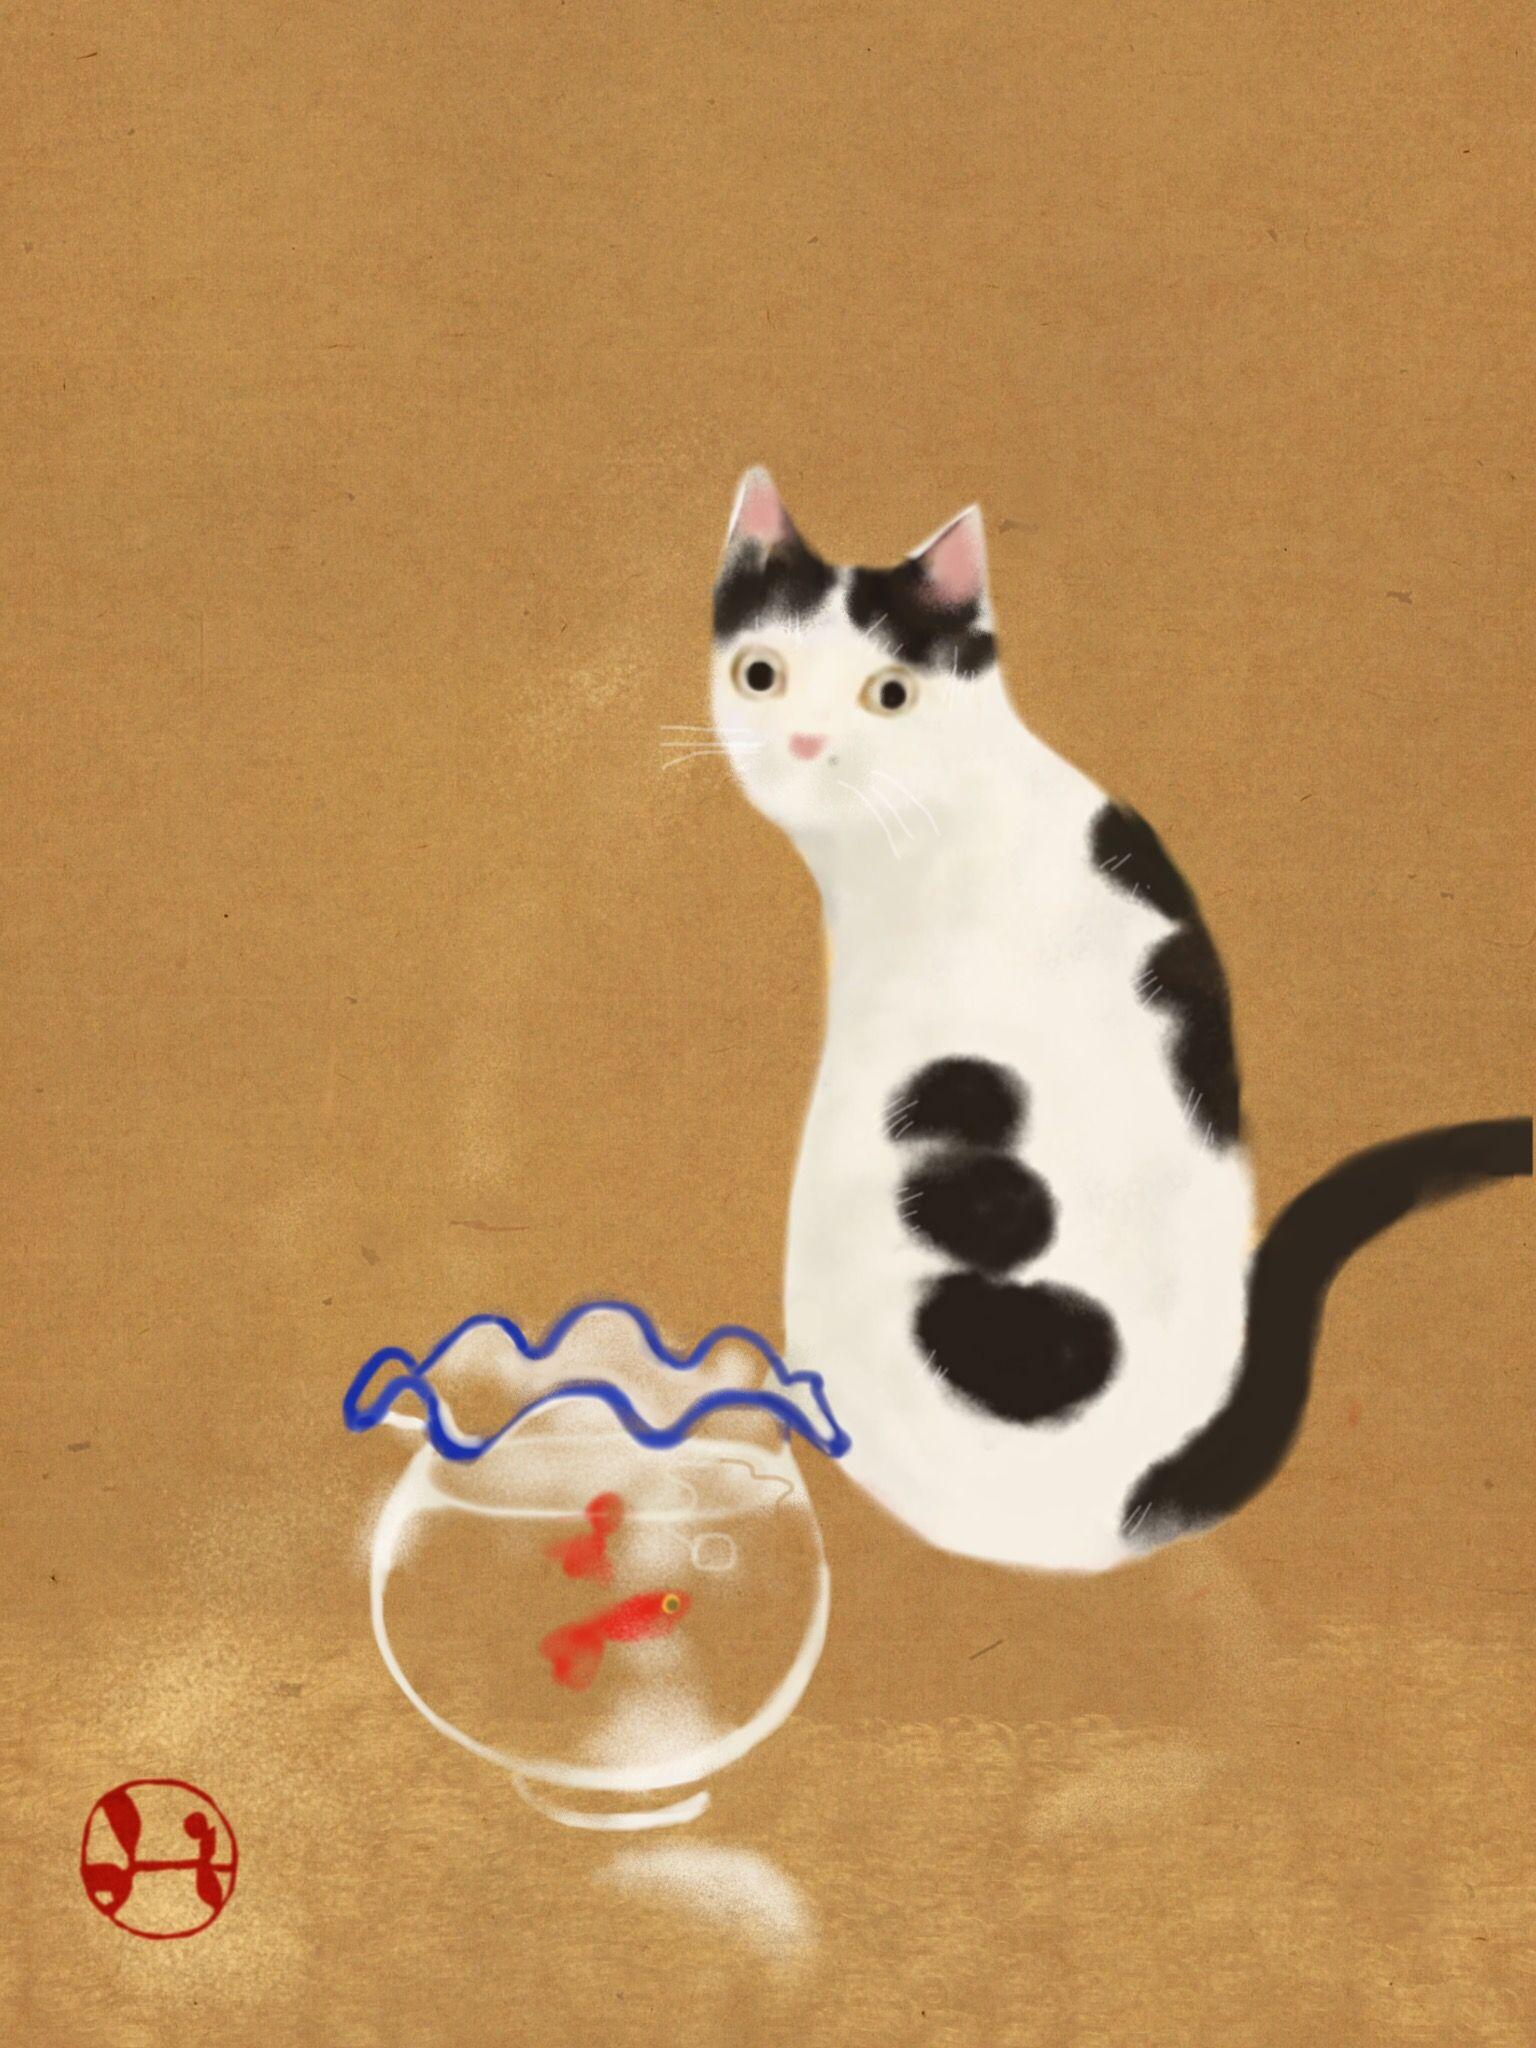 hidetoshi mito _ cat drawing」おしゃれまとめの人気アイデア